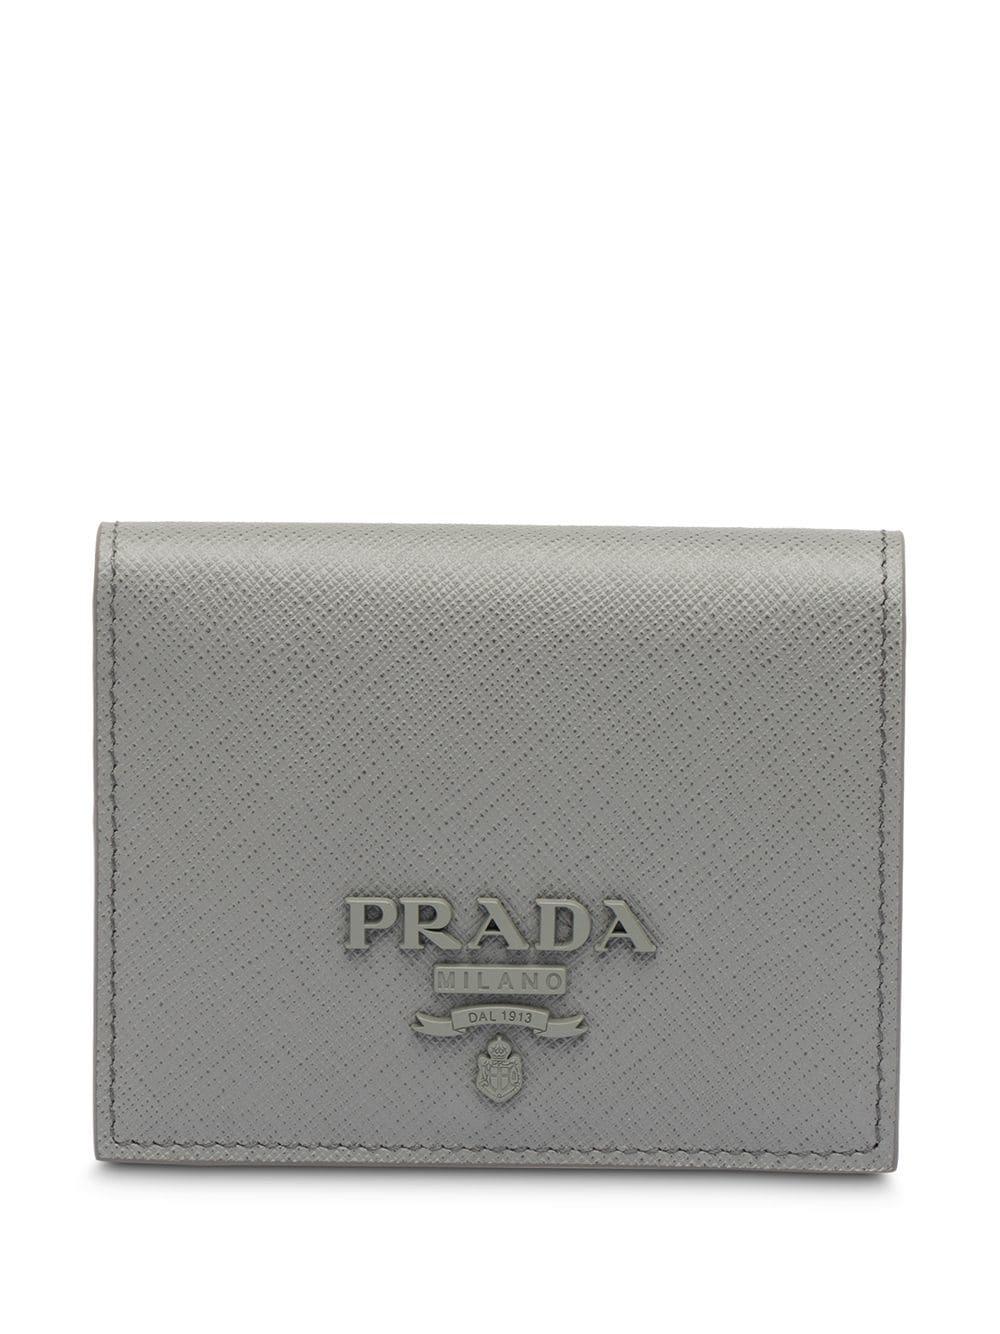 5c7960c3c41a Prada Small Saffiano Leather Wallet - Grey | ModeSens